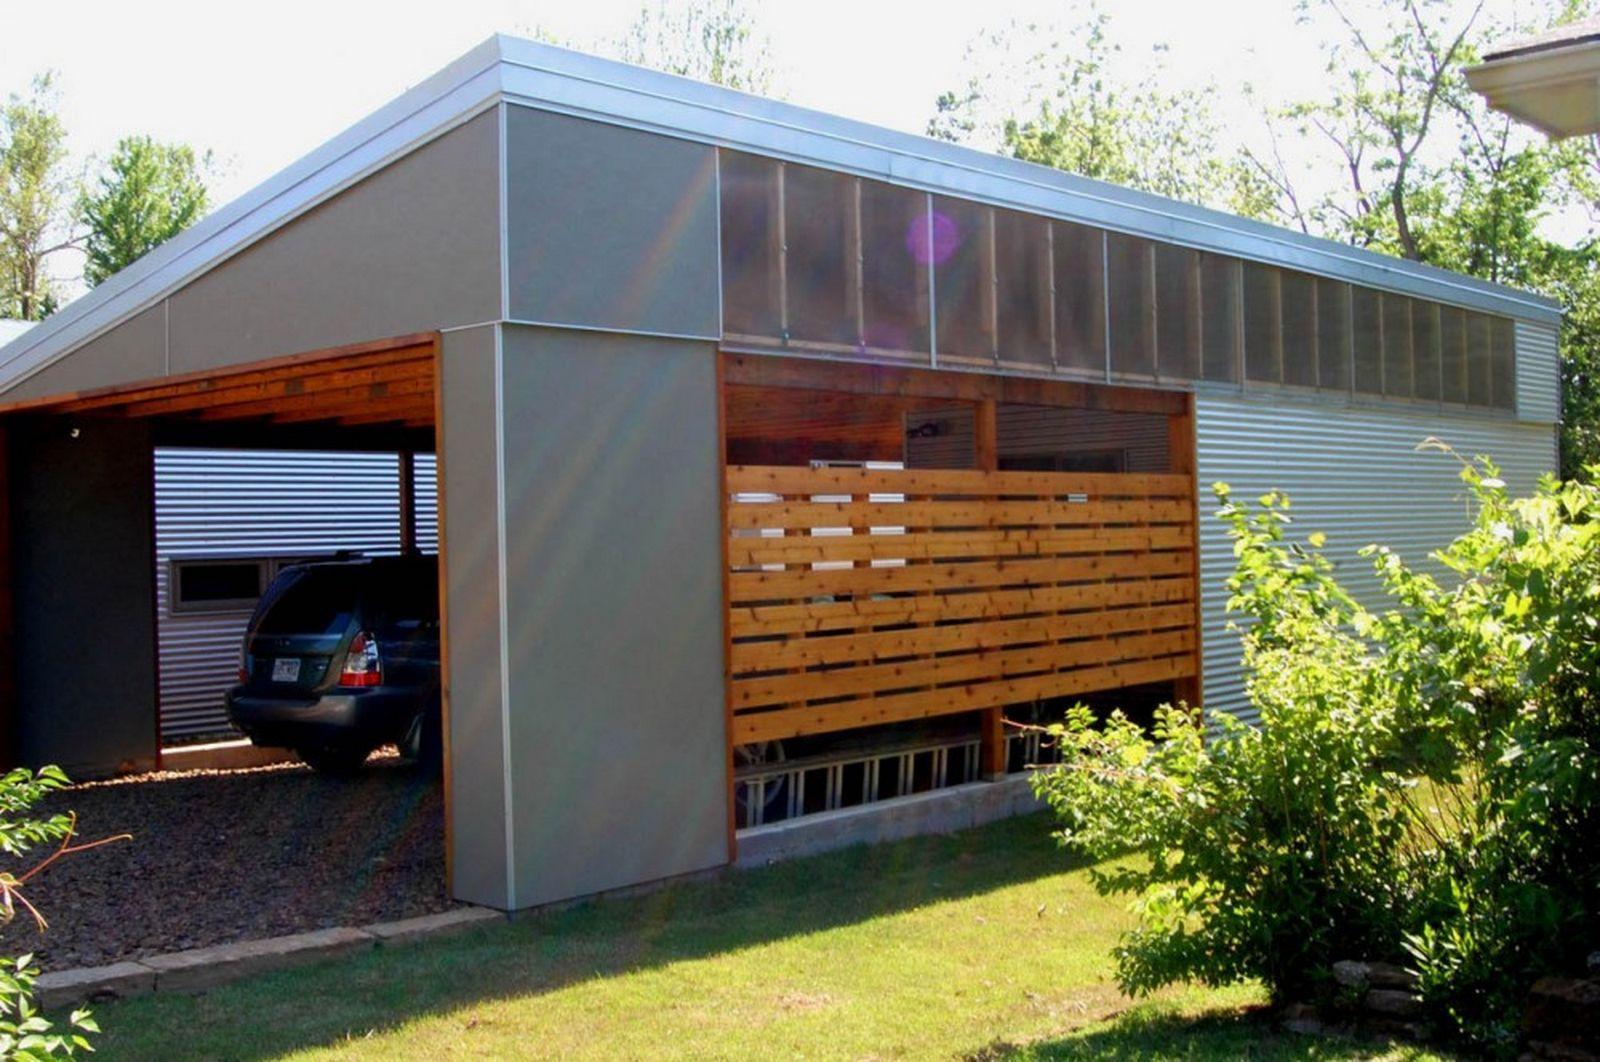 Http Theluxhome Com Wp Content Uploads 2011 10 Allen Residence Modern Sustainable Home Carport Truss 6 Jpeg Carport Designs Modern Garage House Design